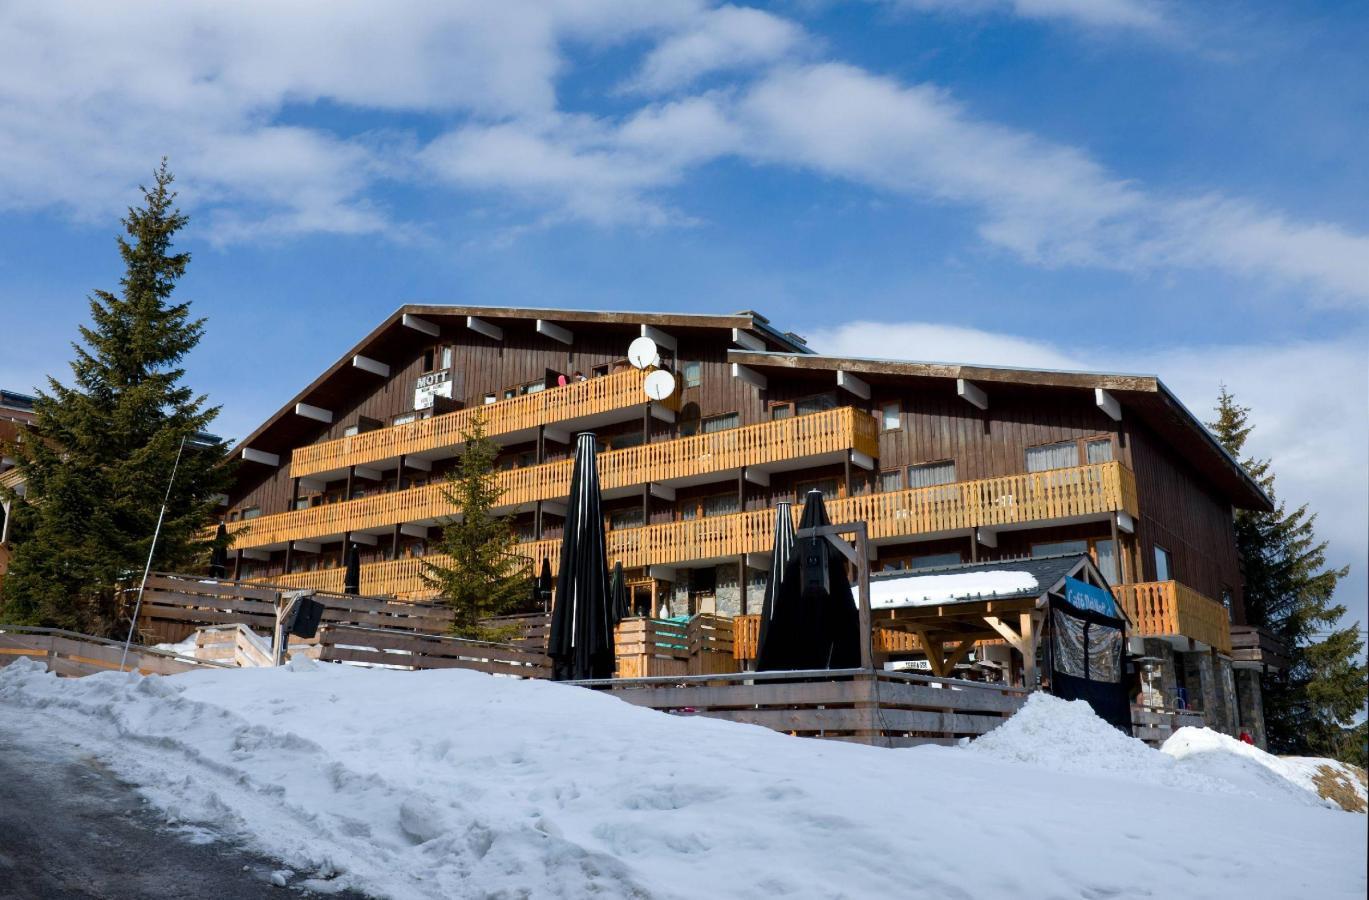 Hotel le mottaret 30 mottaret location vacances ski for Hotel au ski